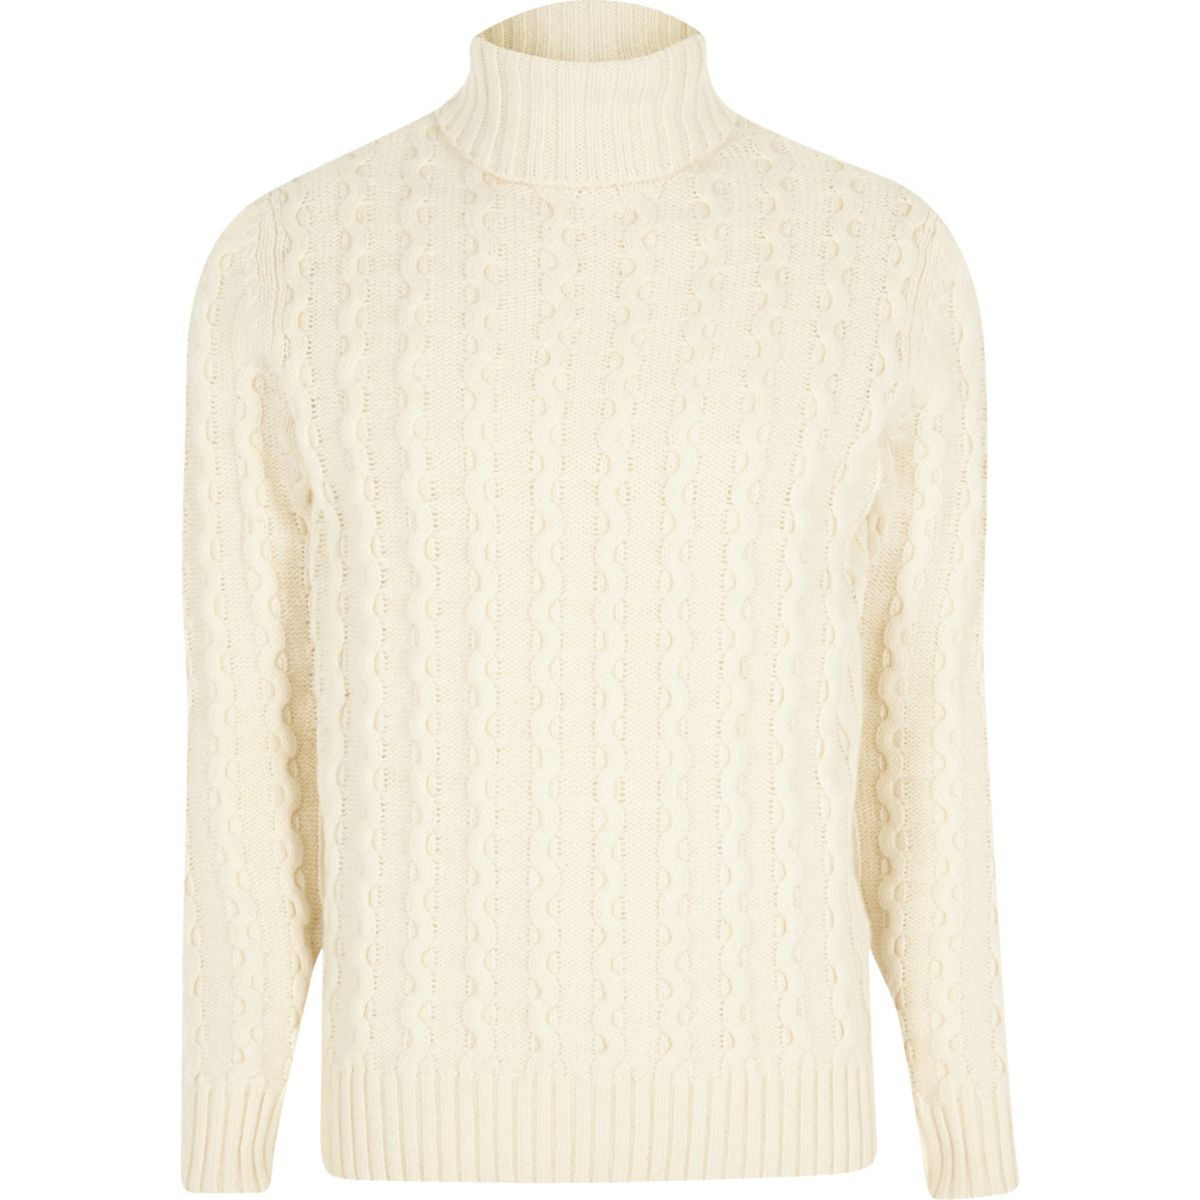 Jack & Jones white knit roll neck jumper